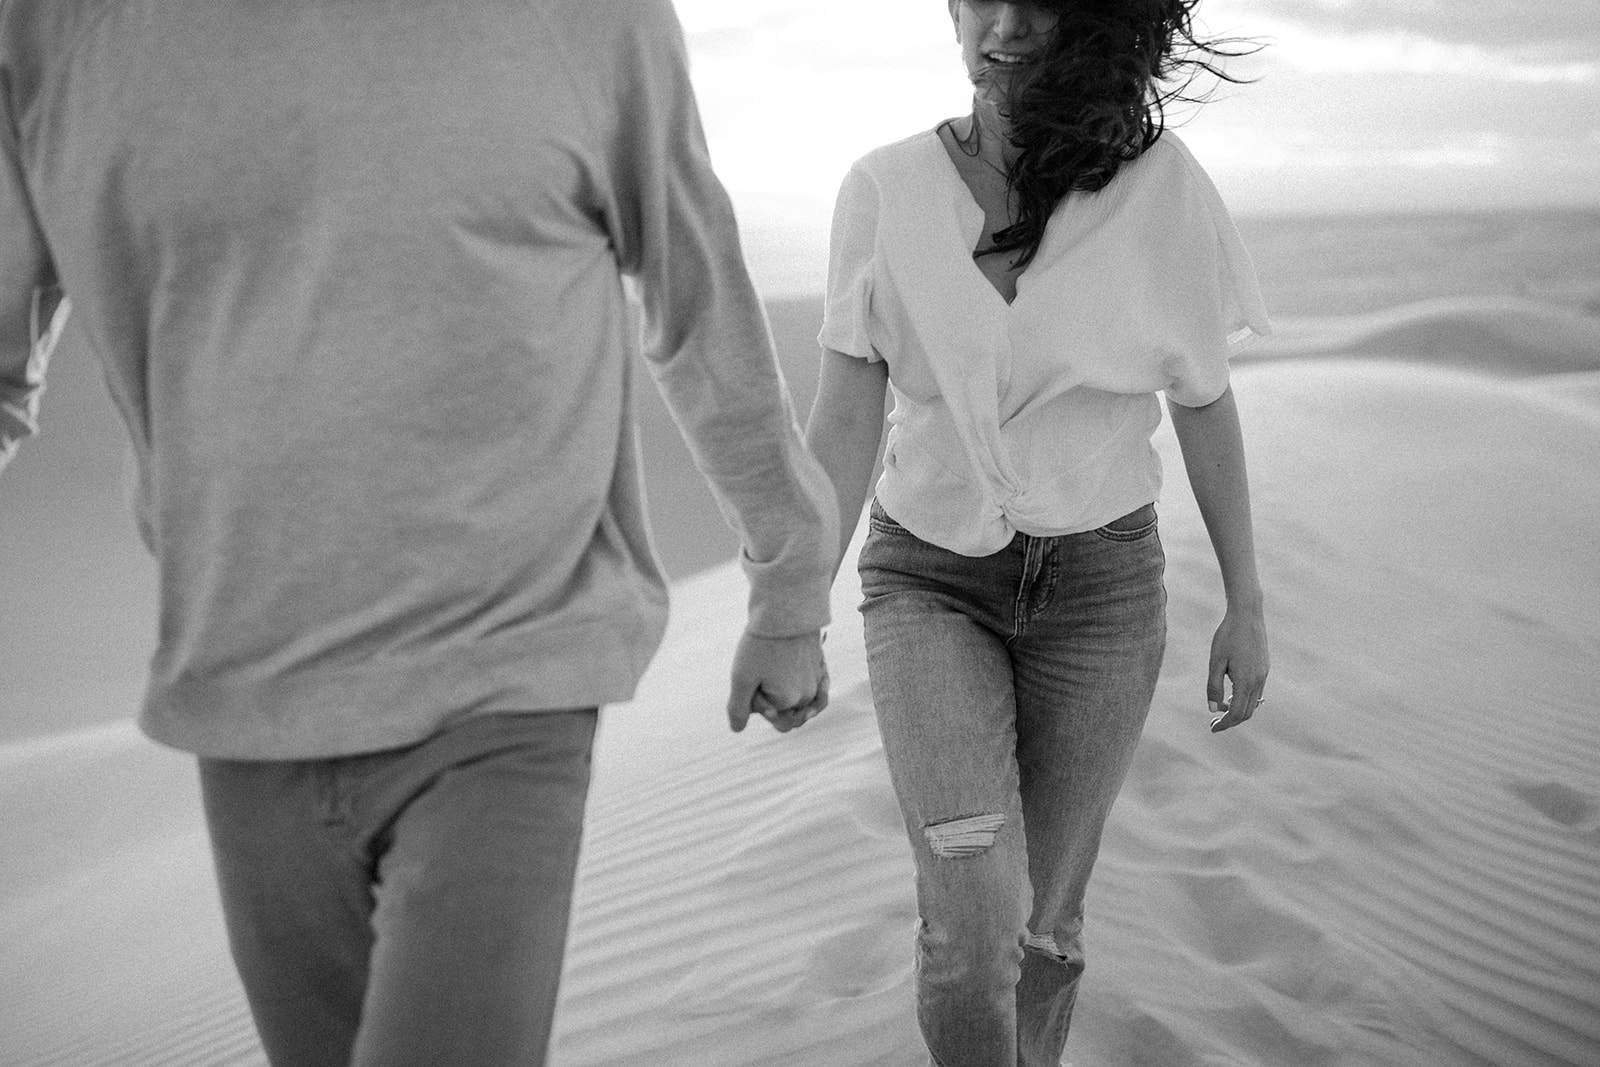 Imperial_Sand_Dunes_Linda_and_Sam_Dawn_Charles_Photographer-242.jpg